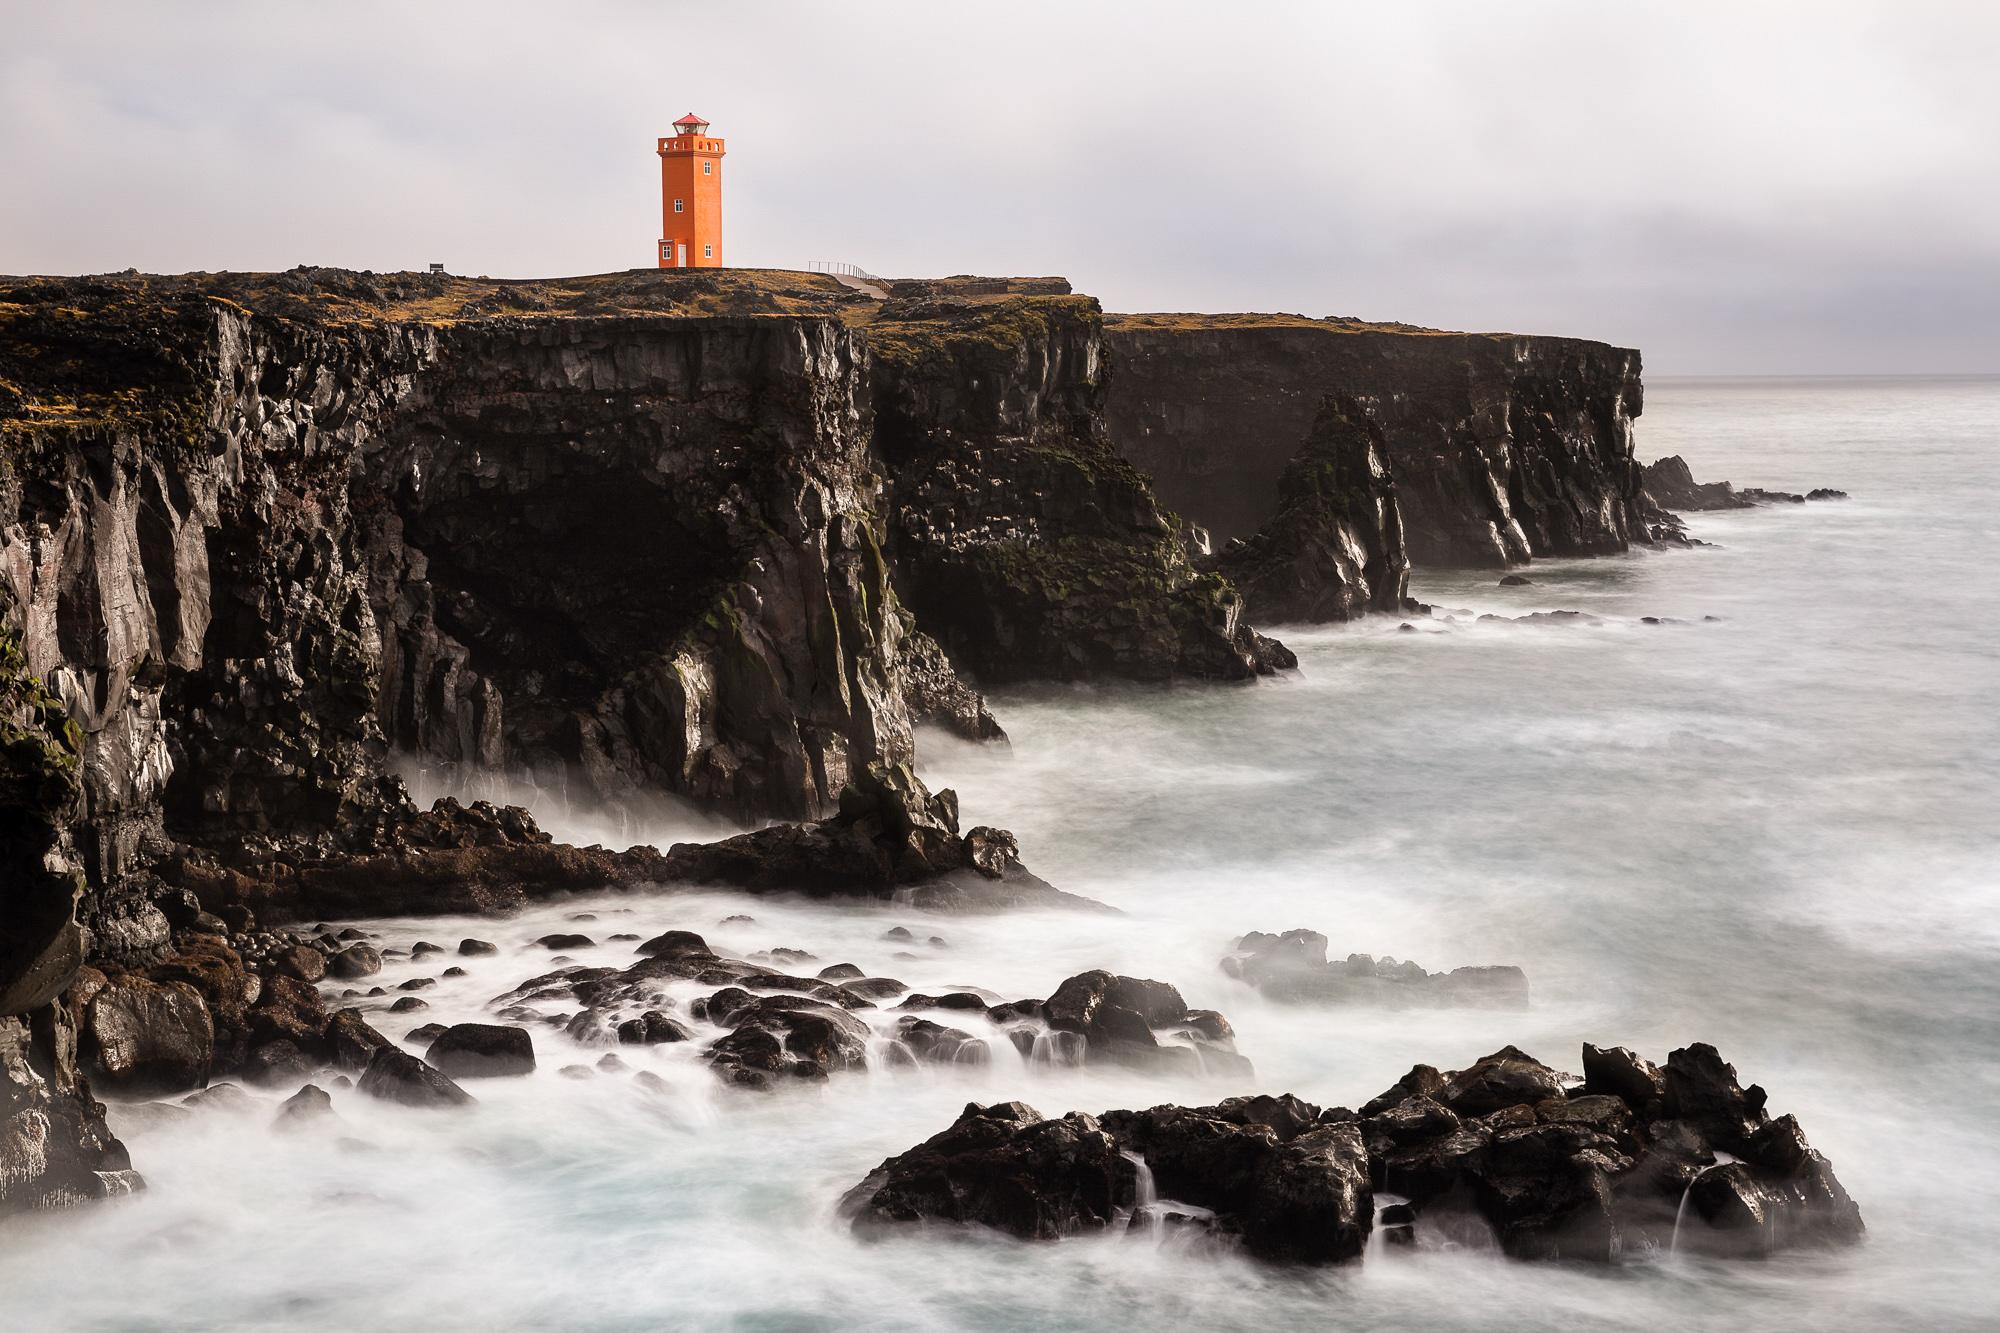 islandia-197-Edit.jpg